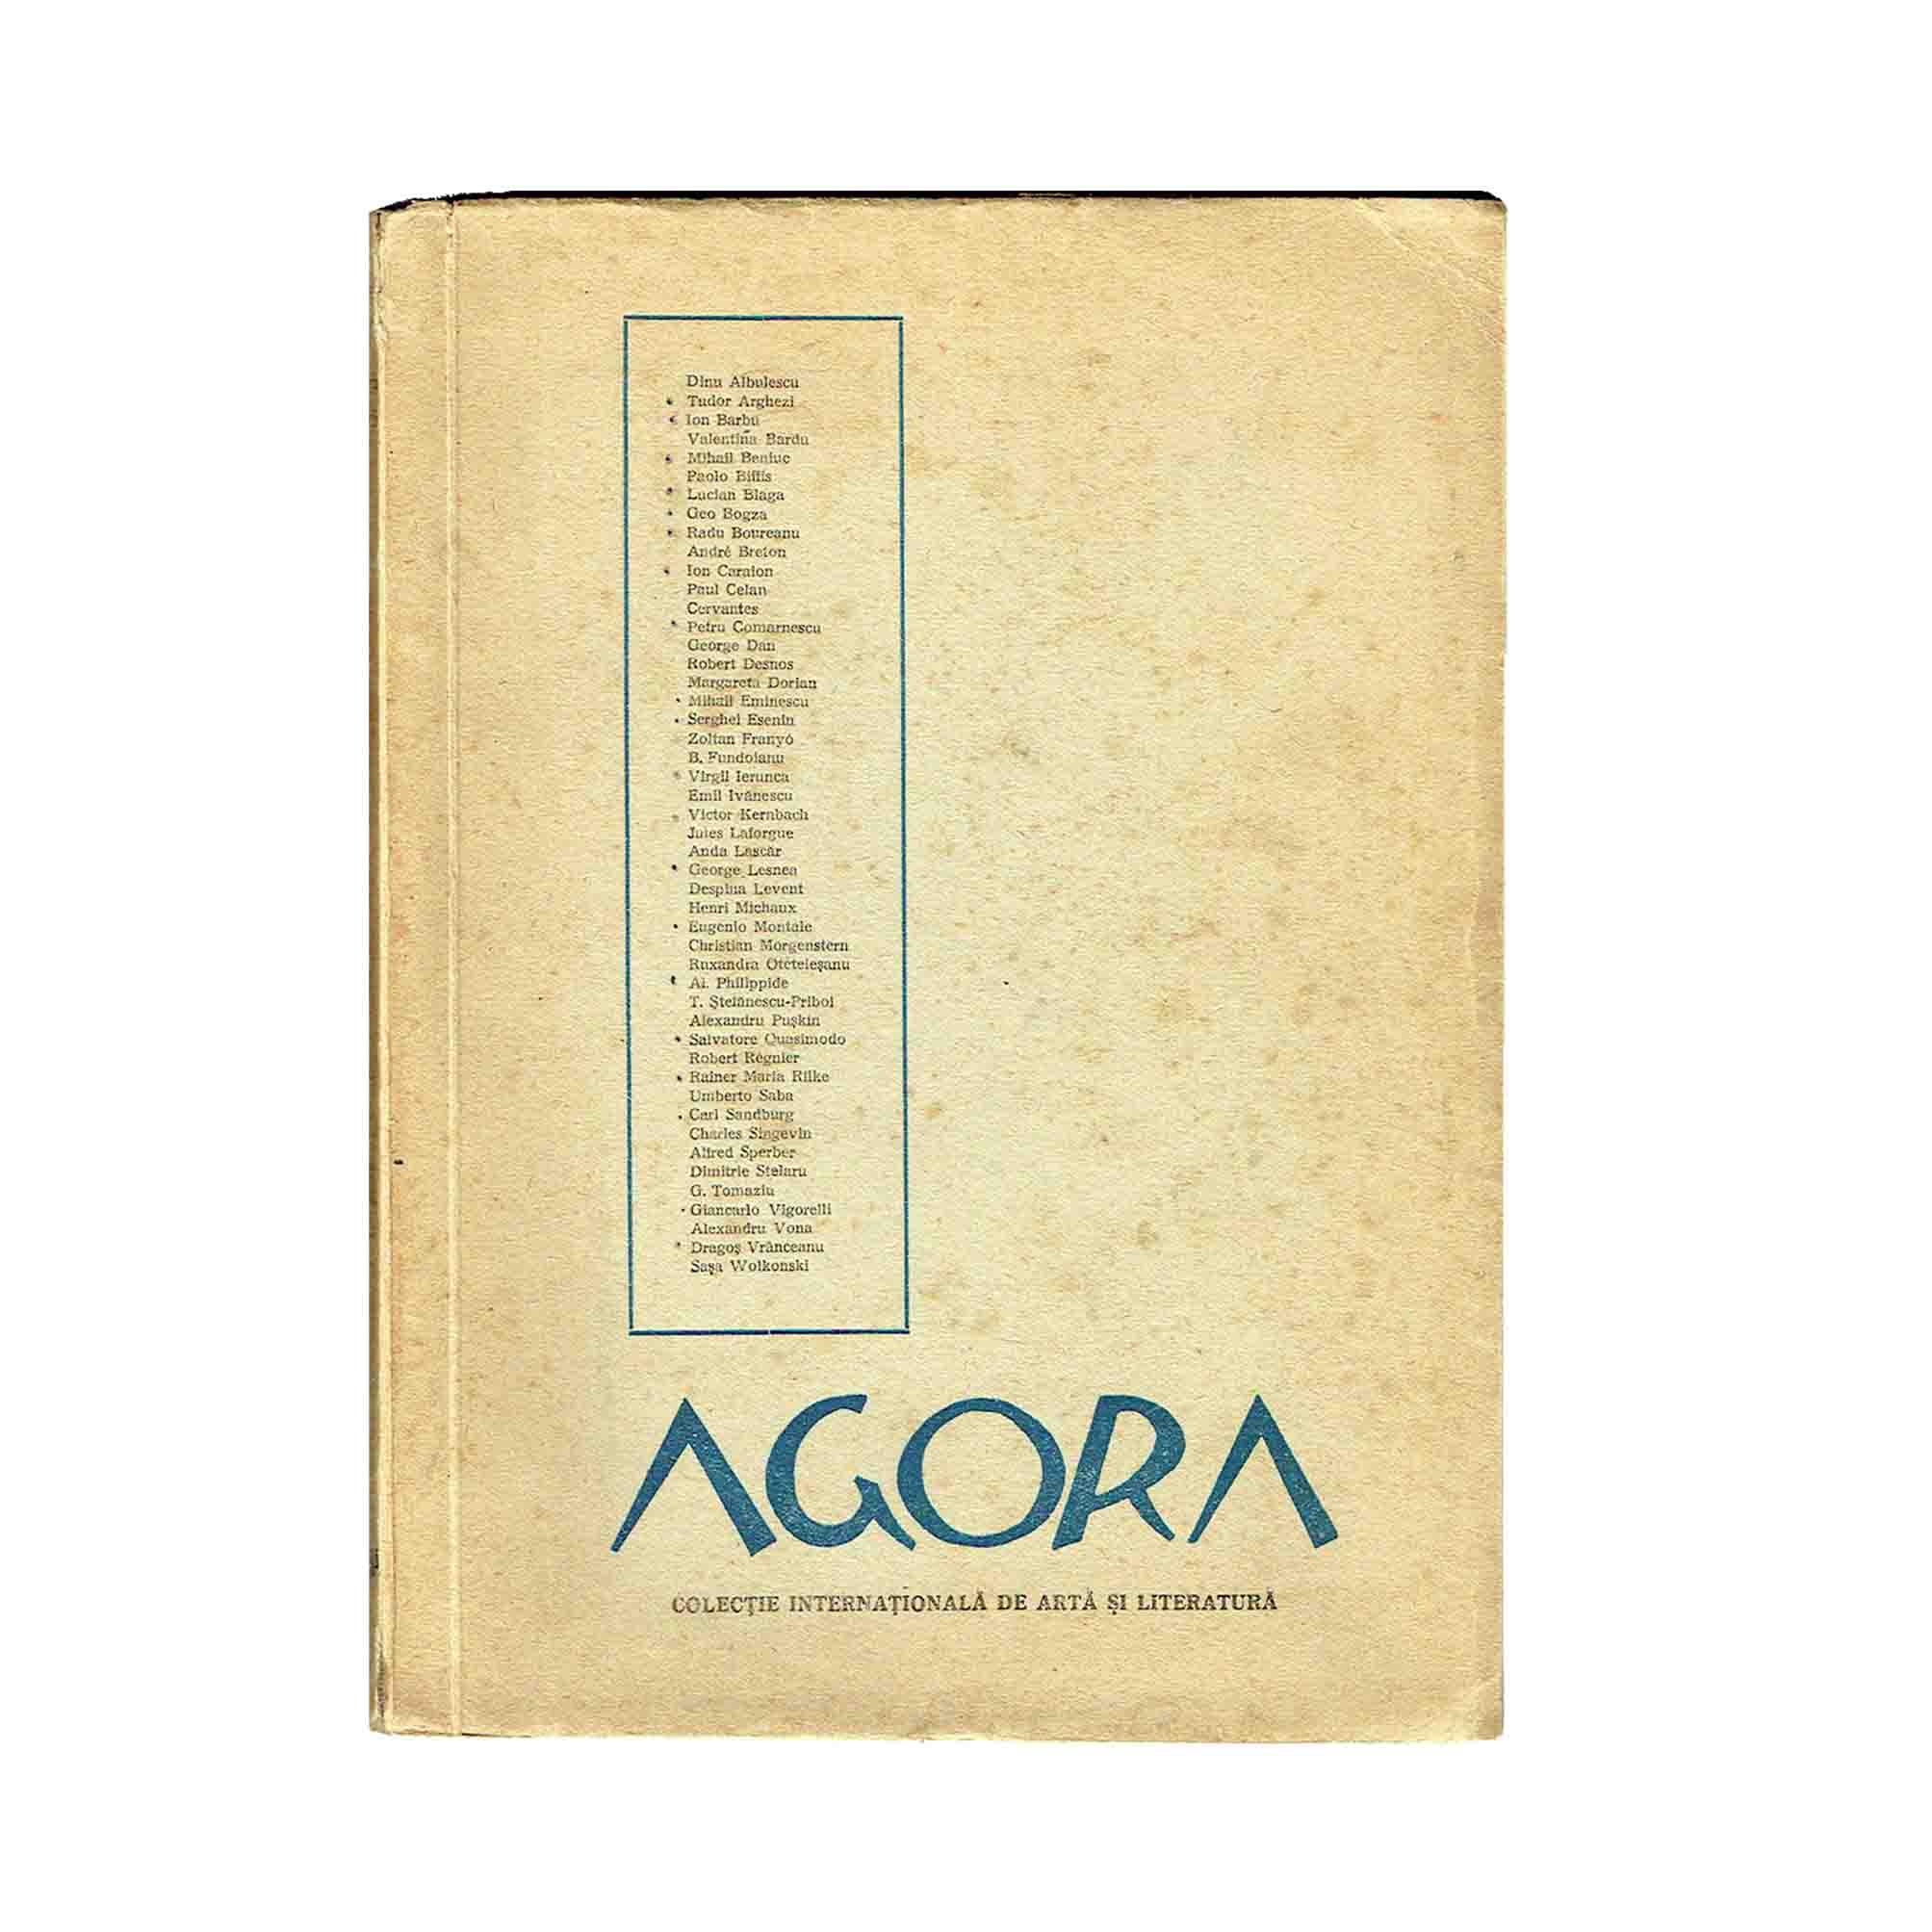 5828K-Celan-Agora-1947-Vorzug-14-Umschlag-recto-frei-N.jpeg